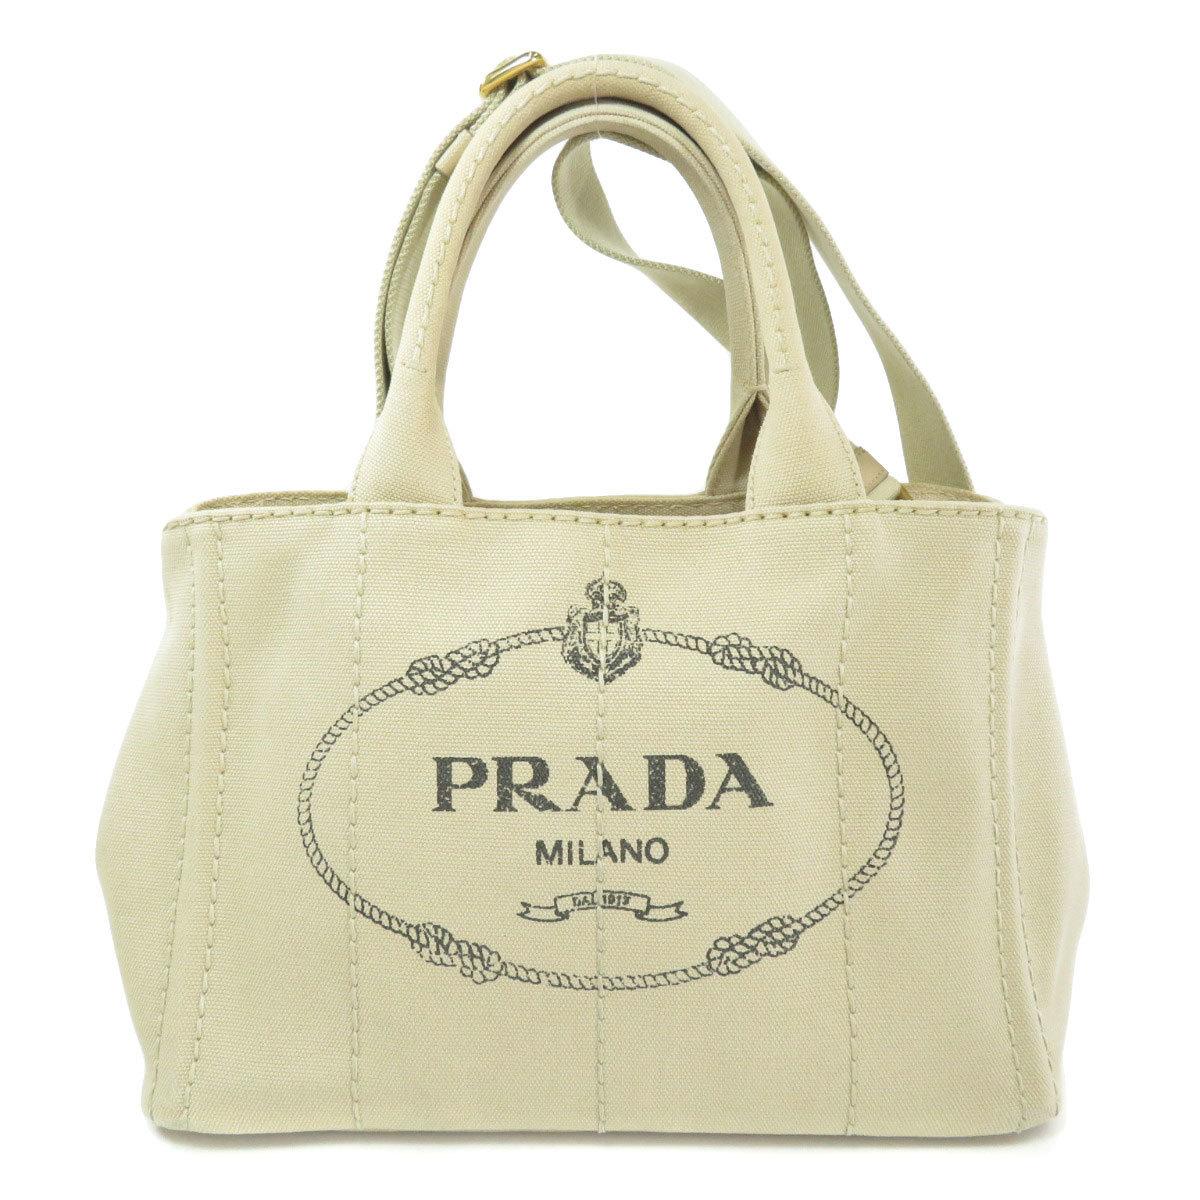 Prada 1BG439 Kanapa Mini 2WAY Tote Bag Canvas Ladies